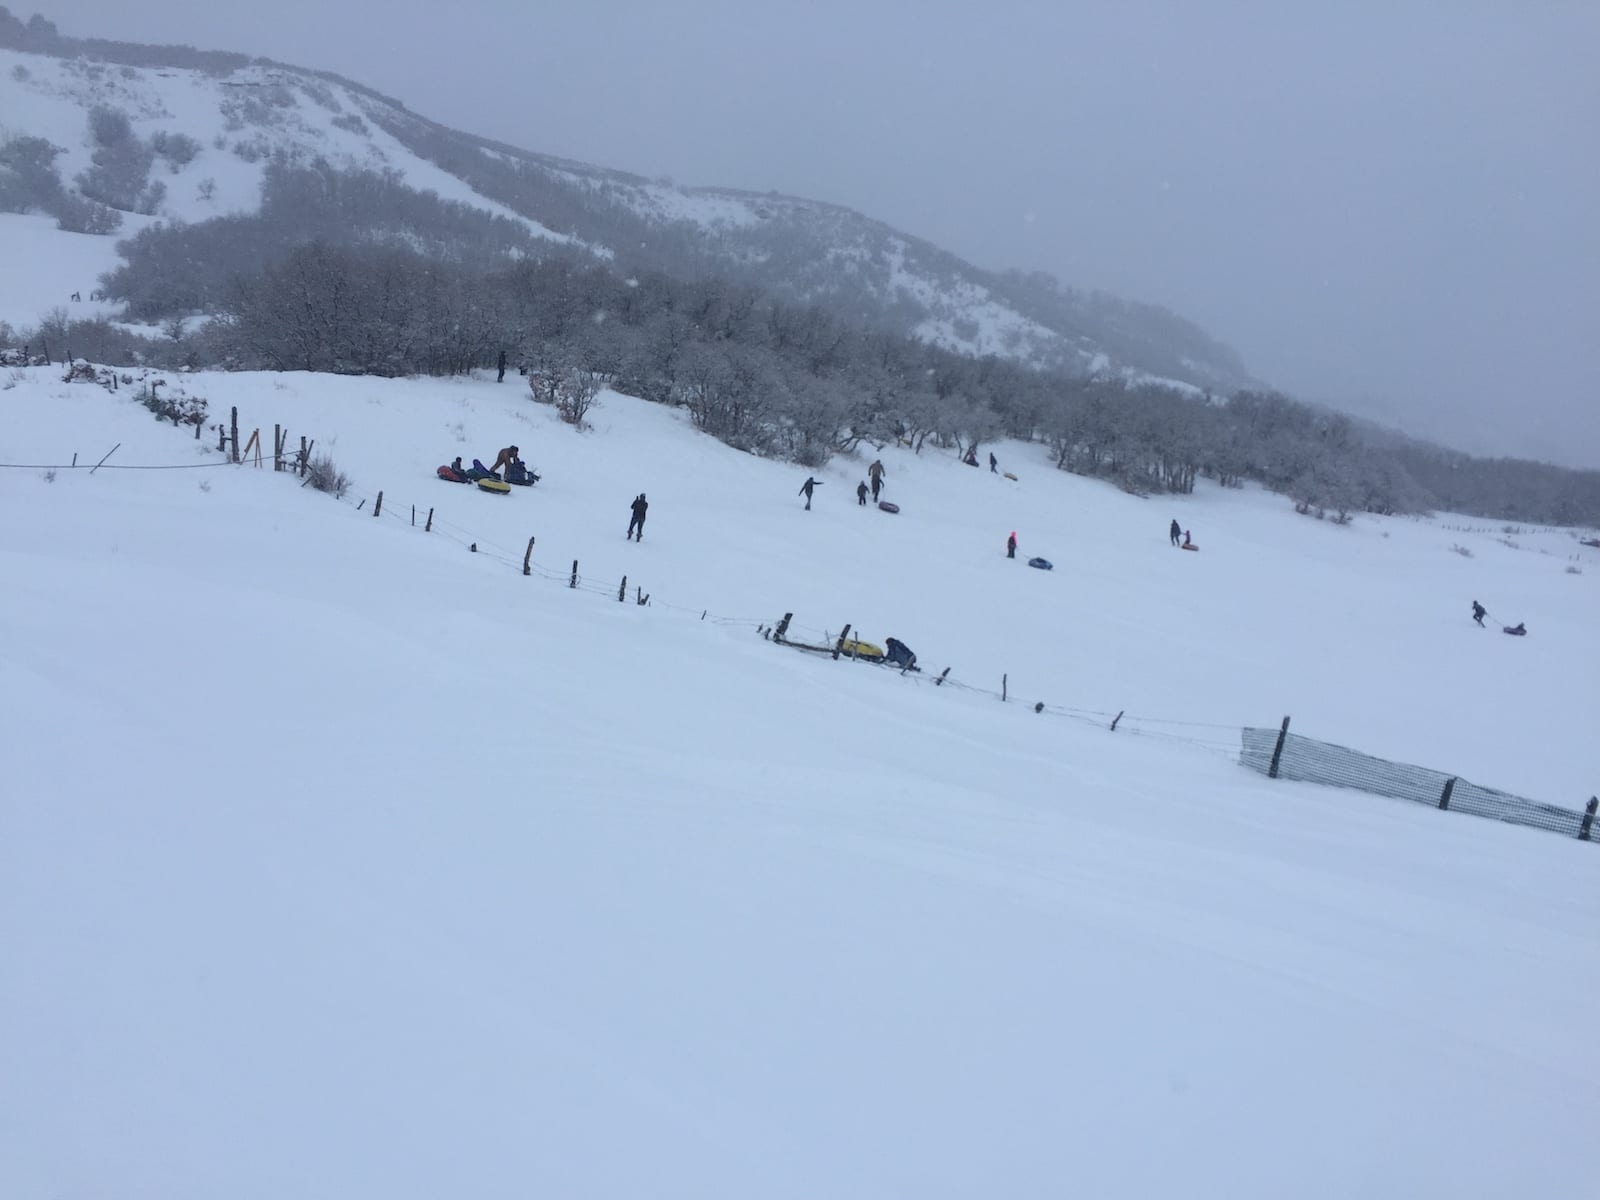 Hesperus Ski Area Tubing Hill Aerial